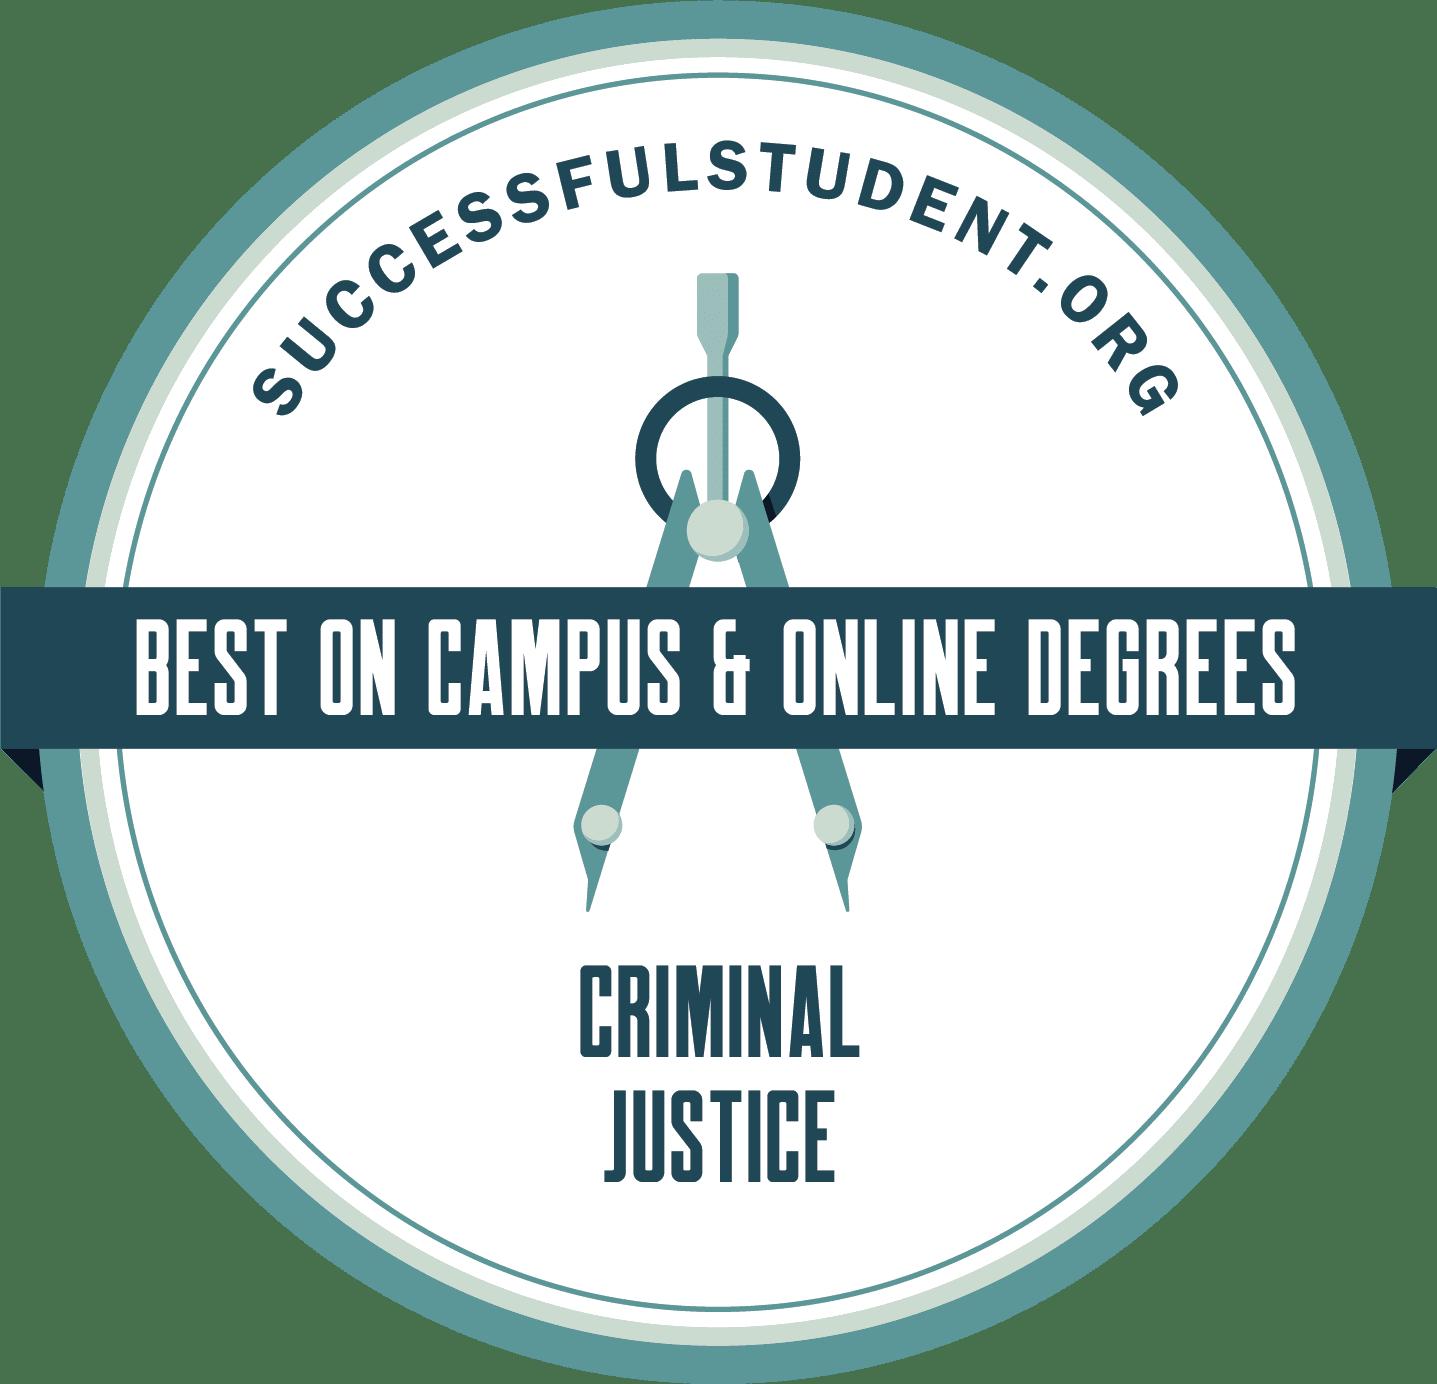 Criminal Justice Degree: The 50 Best Schools's Badge